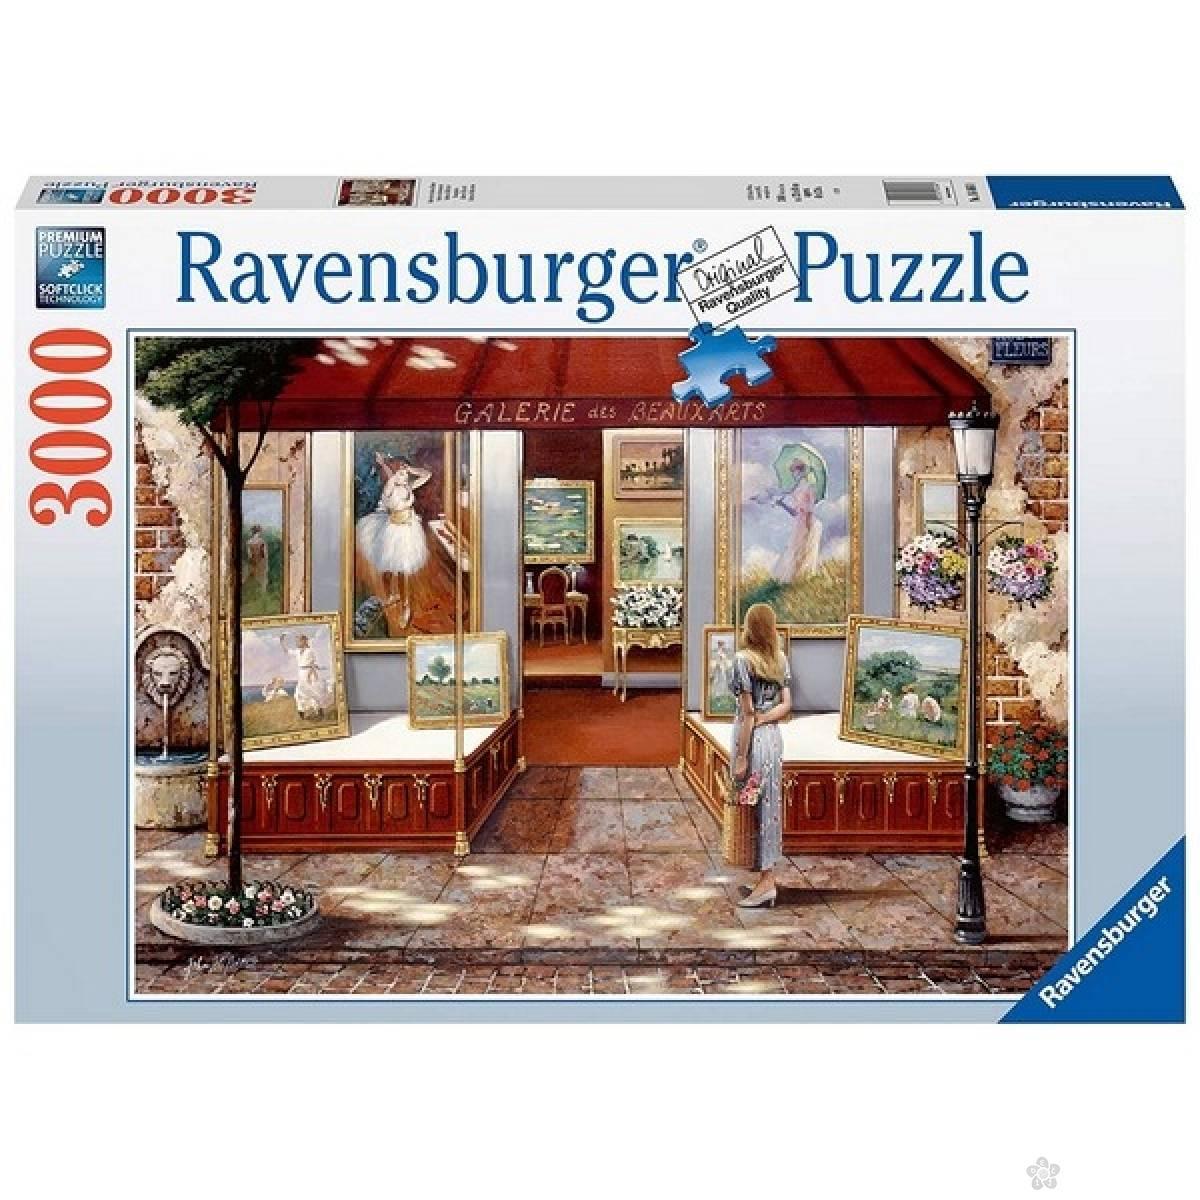 Ravensburger puzzle Galerija lepih umetnosti RA16466